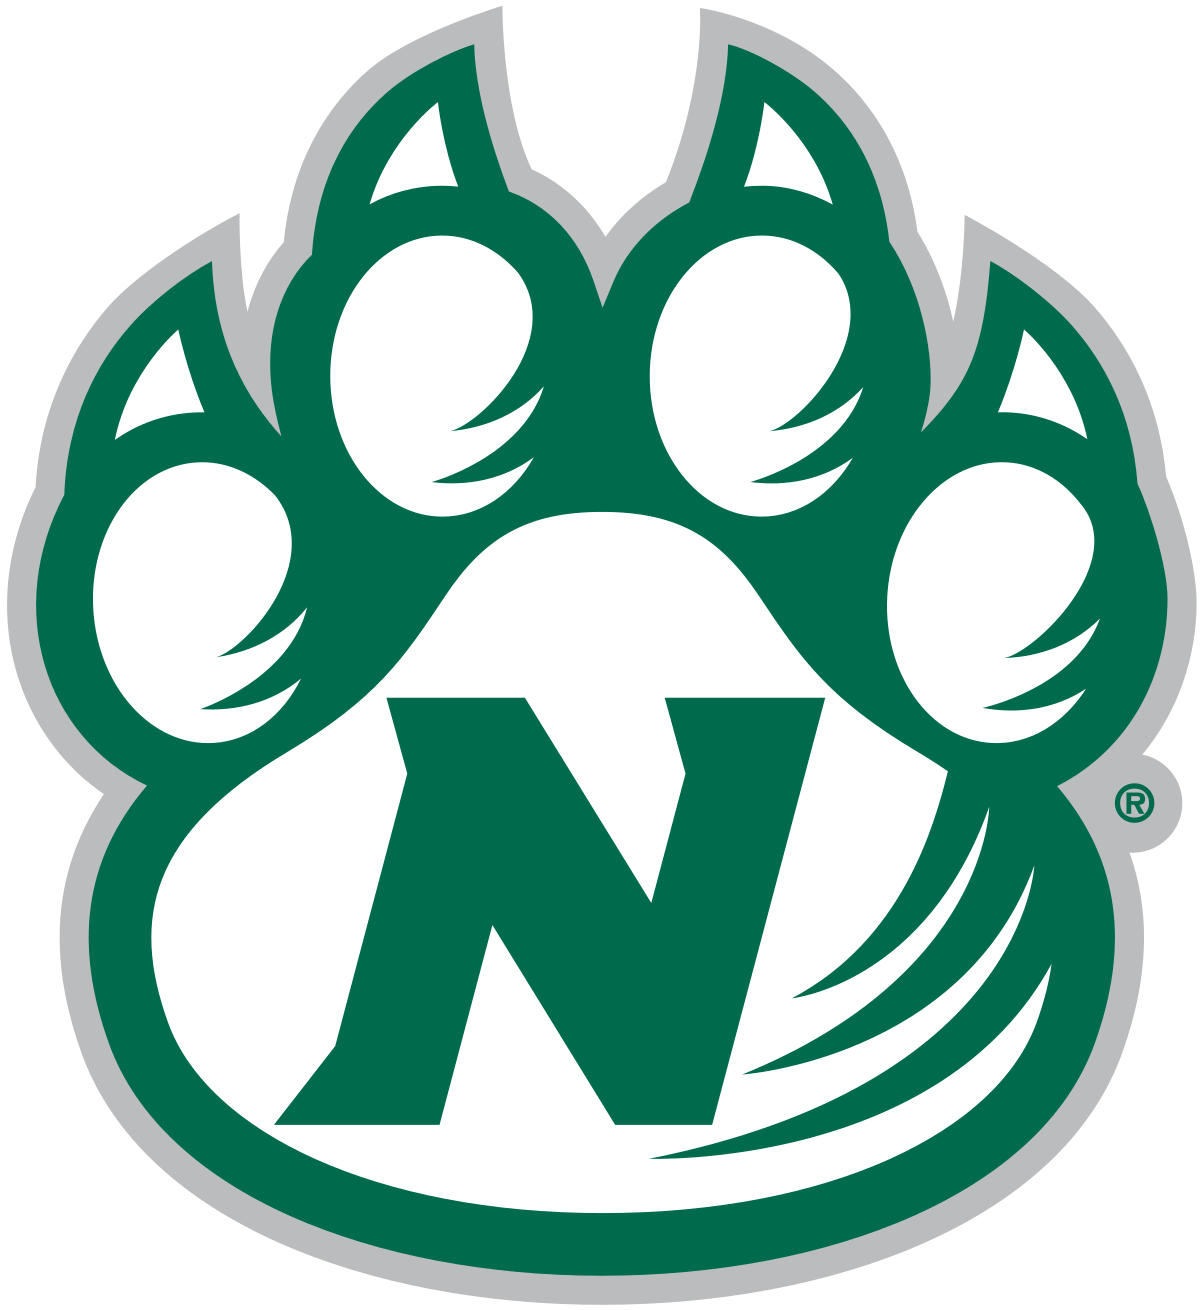 Northwest Missouri State University Bearcats Hall of Fame